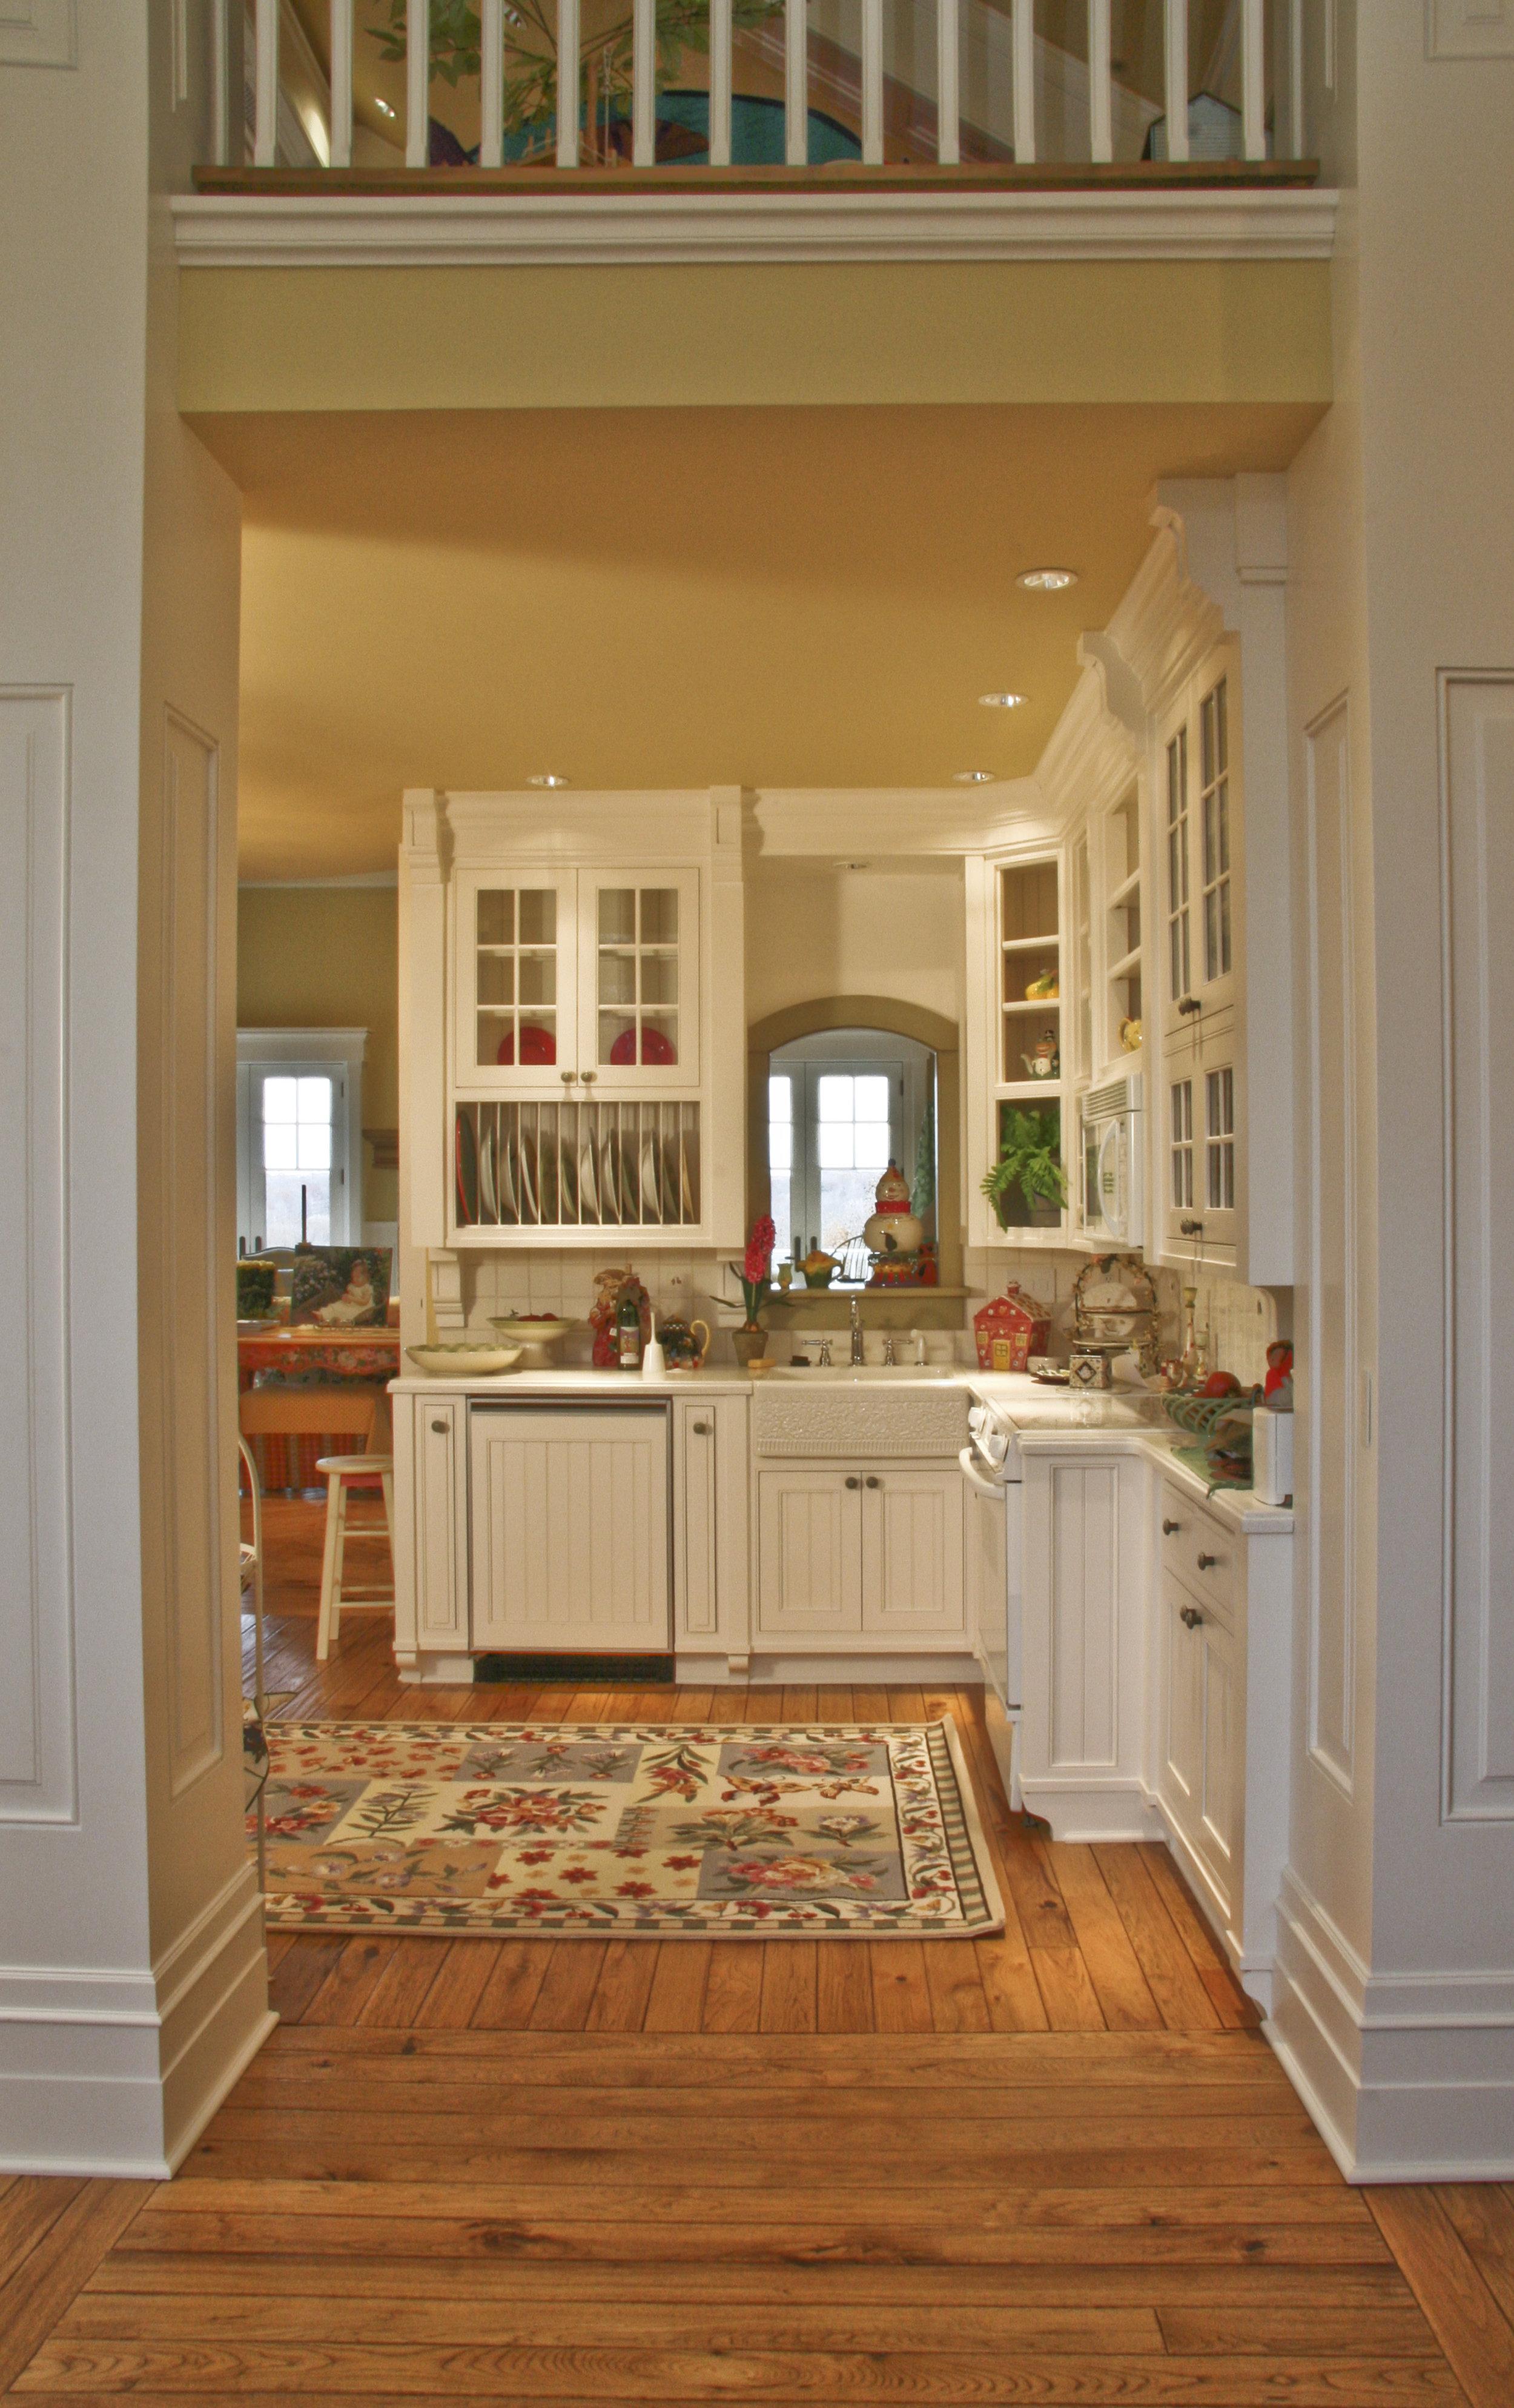 UL Kitchen IMG_2384.jpg